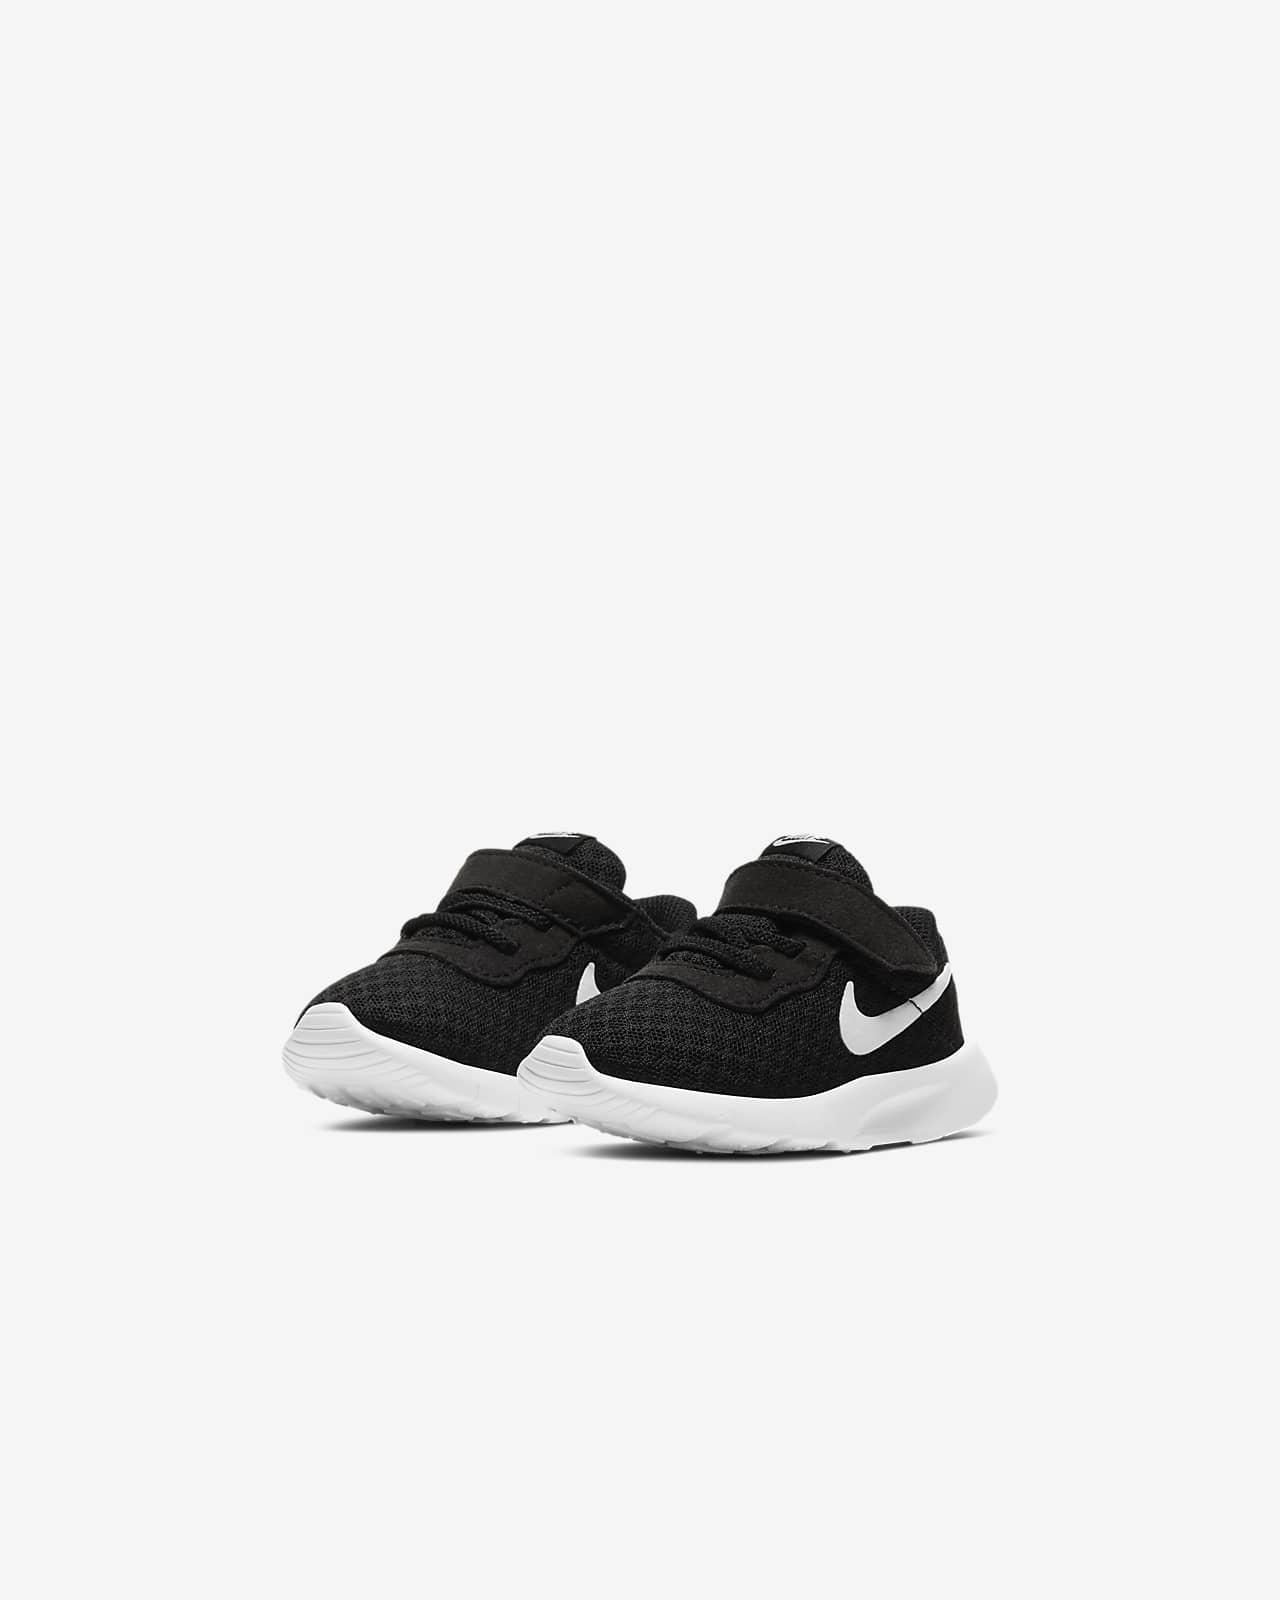 Spedbarn og småbarn Barn. Nike NO